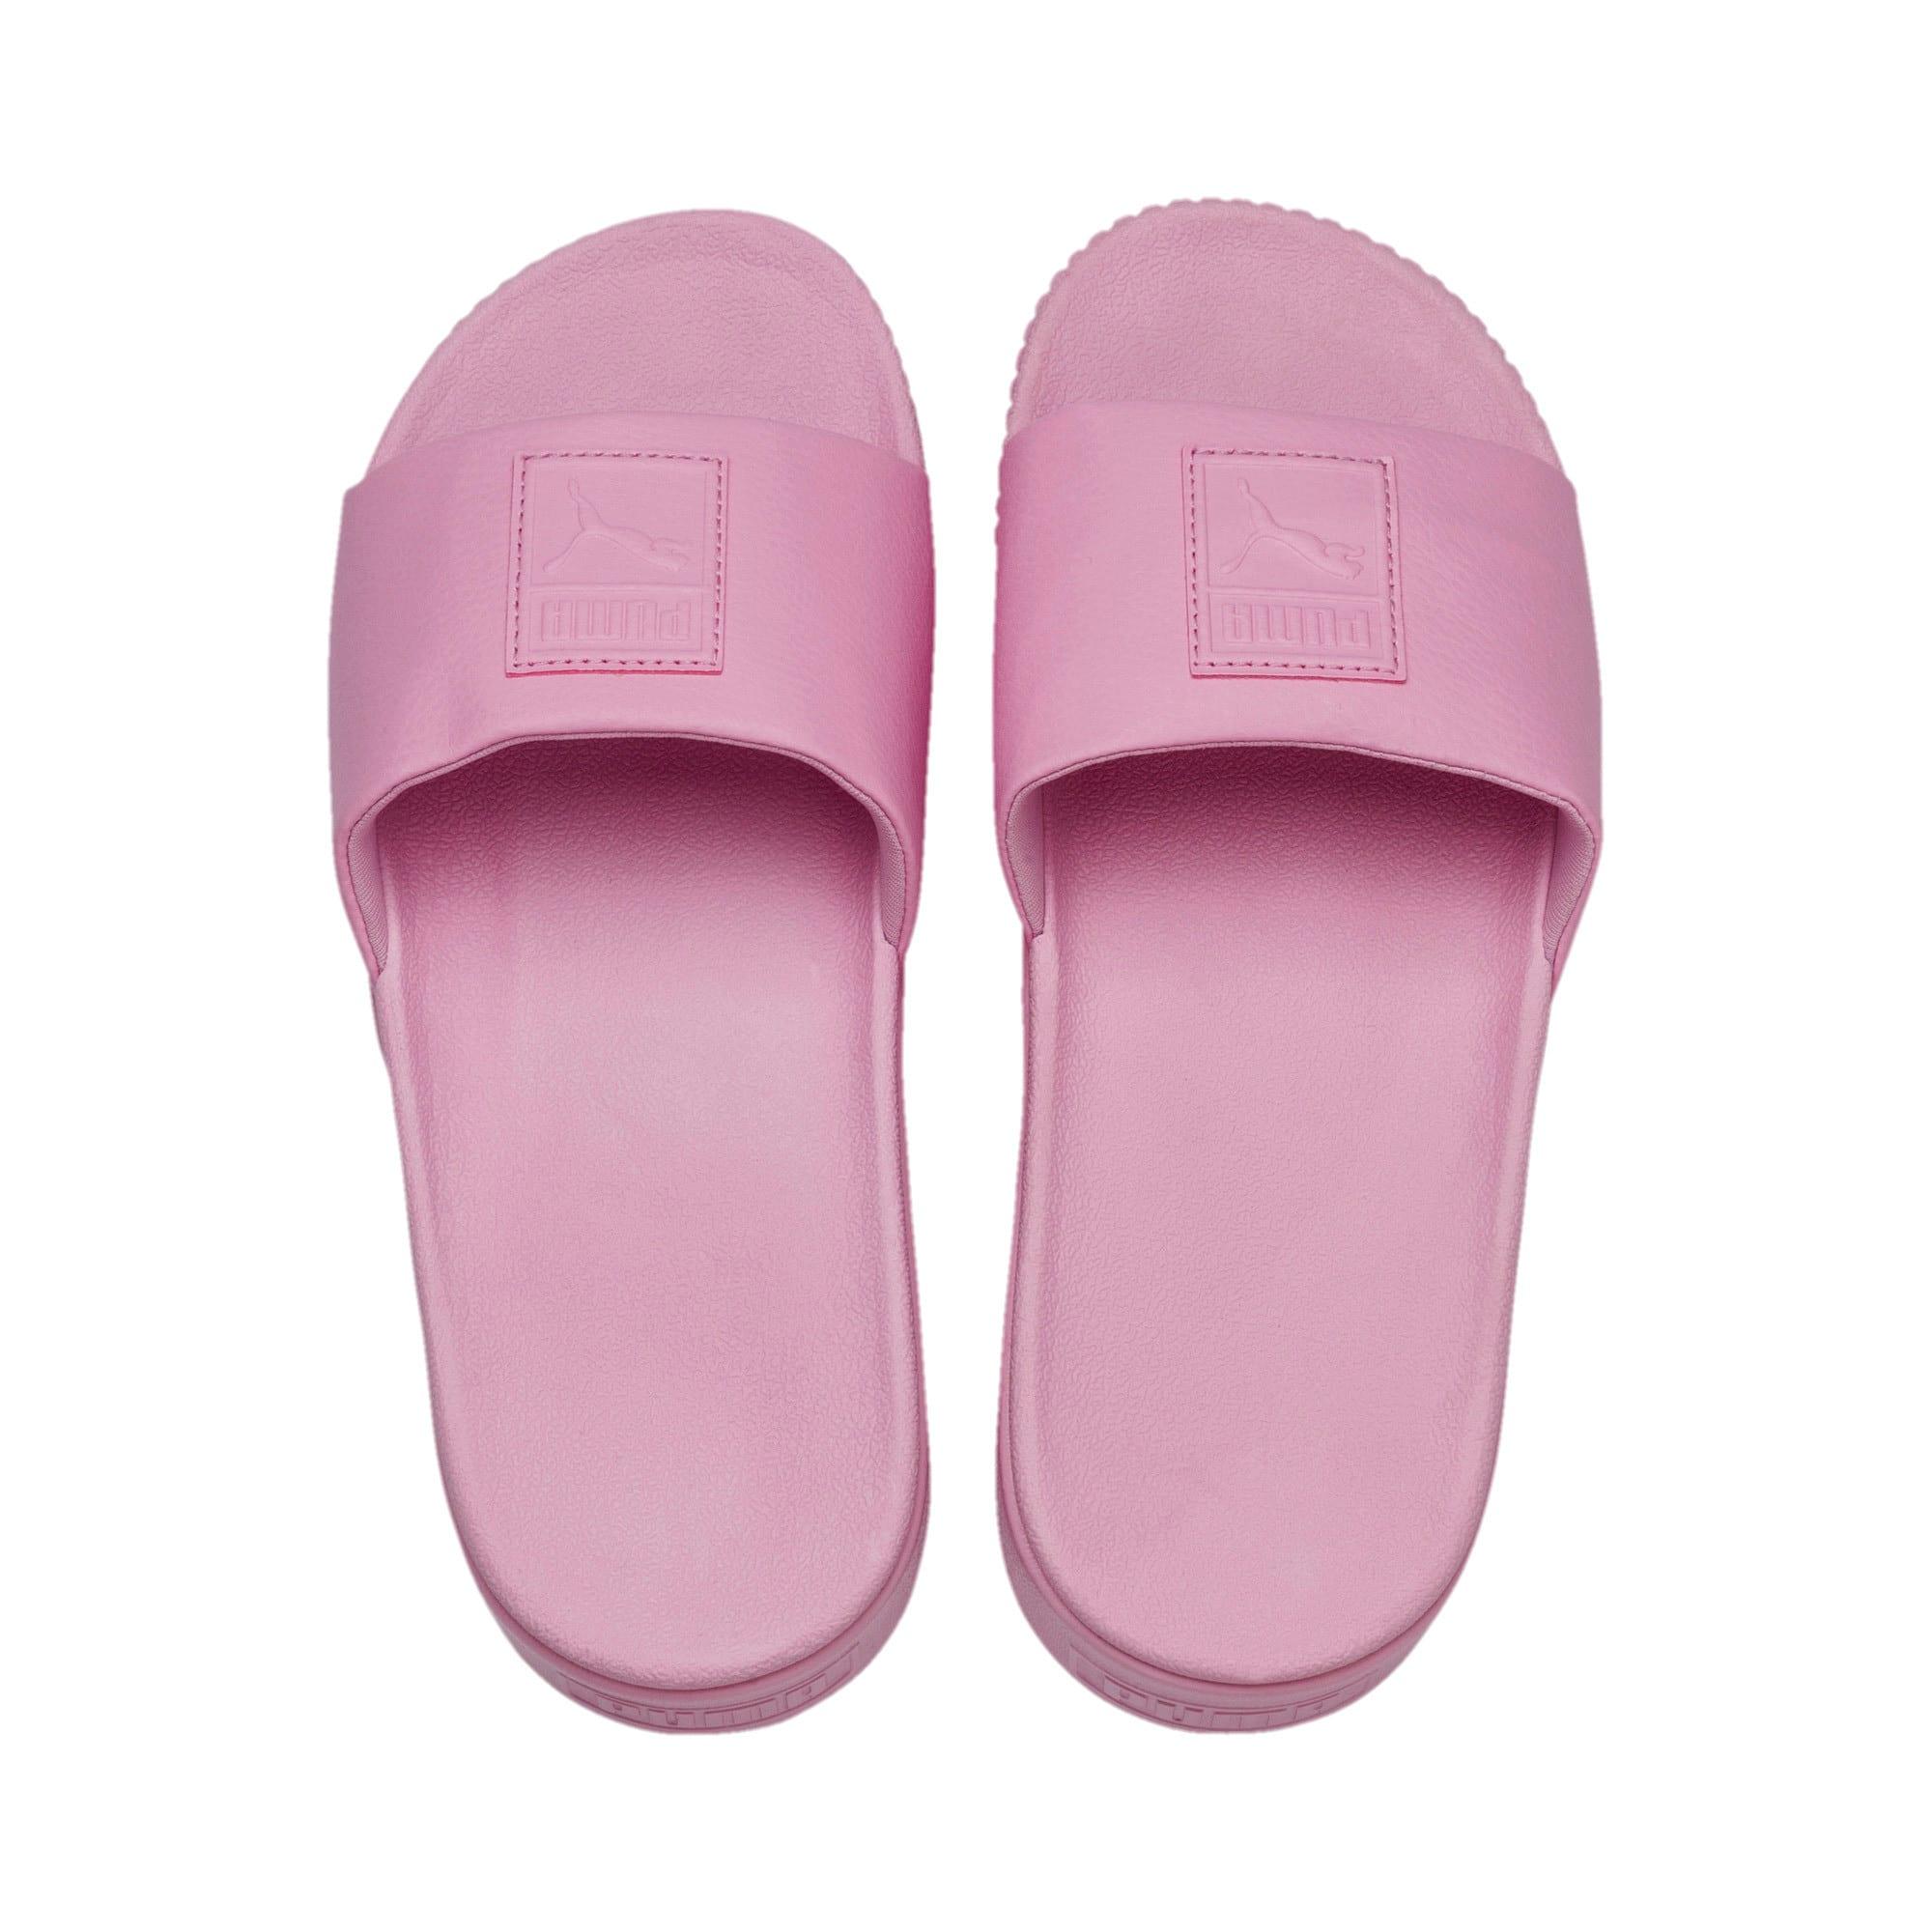 Miniatura 6 de Sandalias con plataforma Slide para mujer, Pale Pink-Pale Pink, mediano